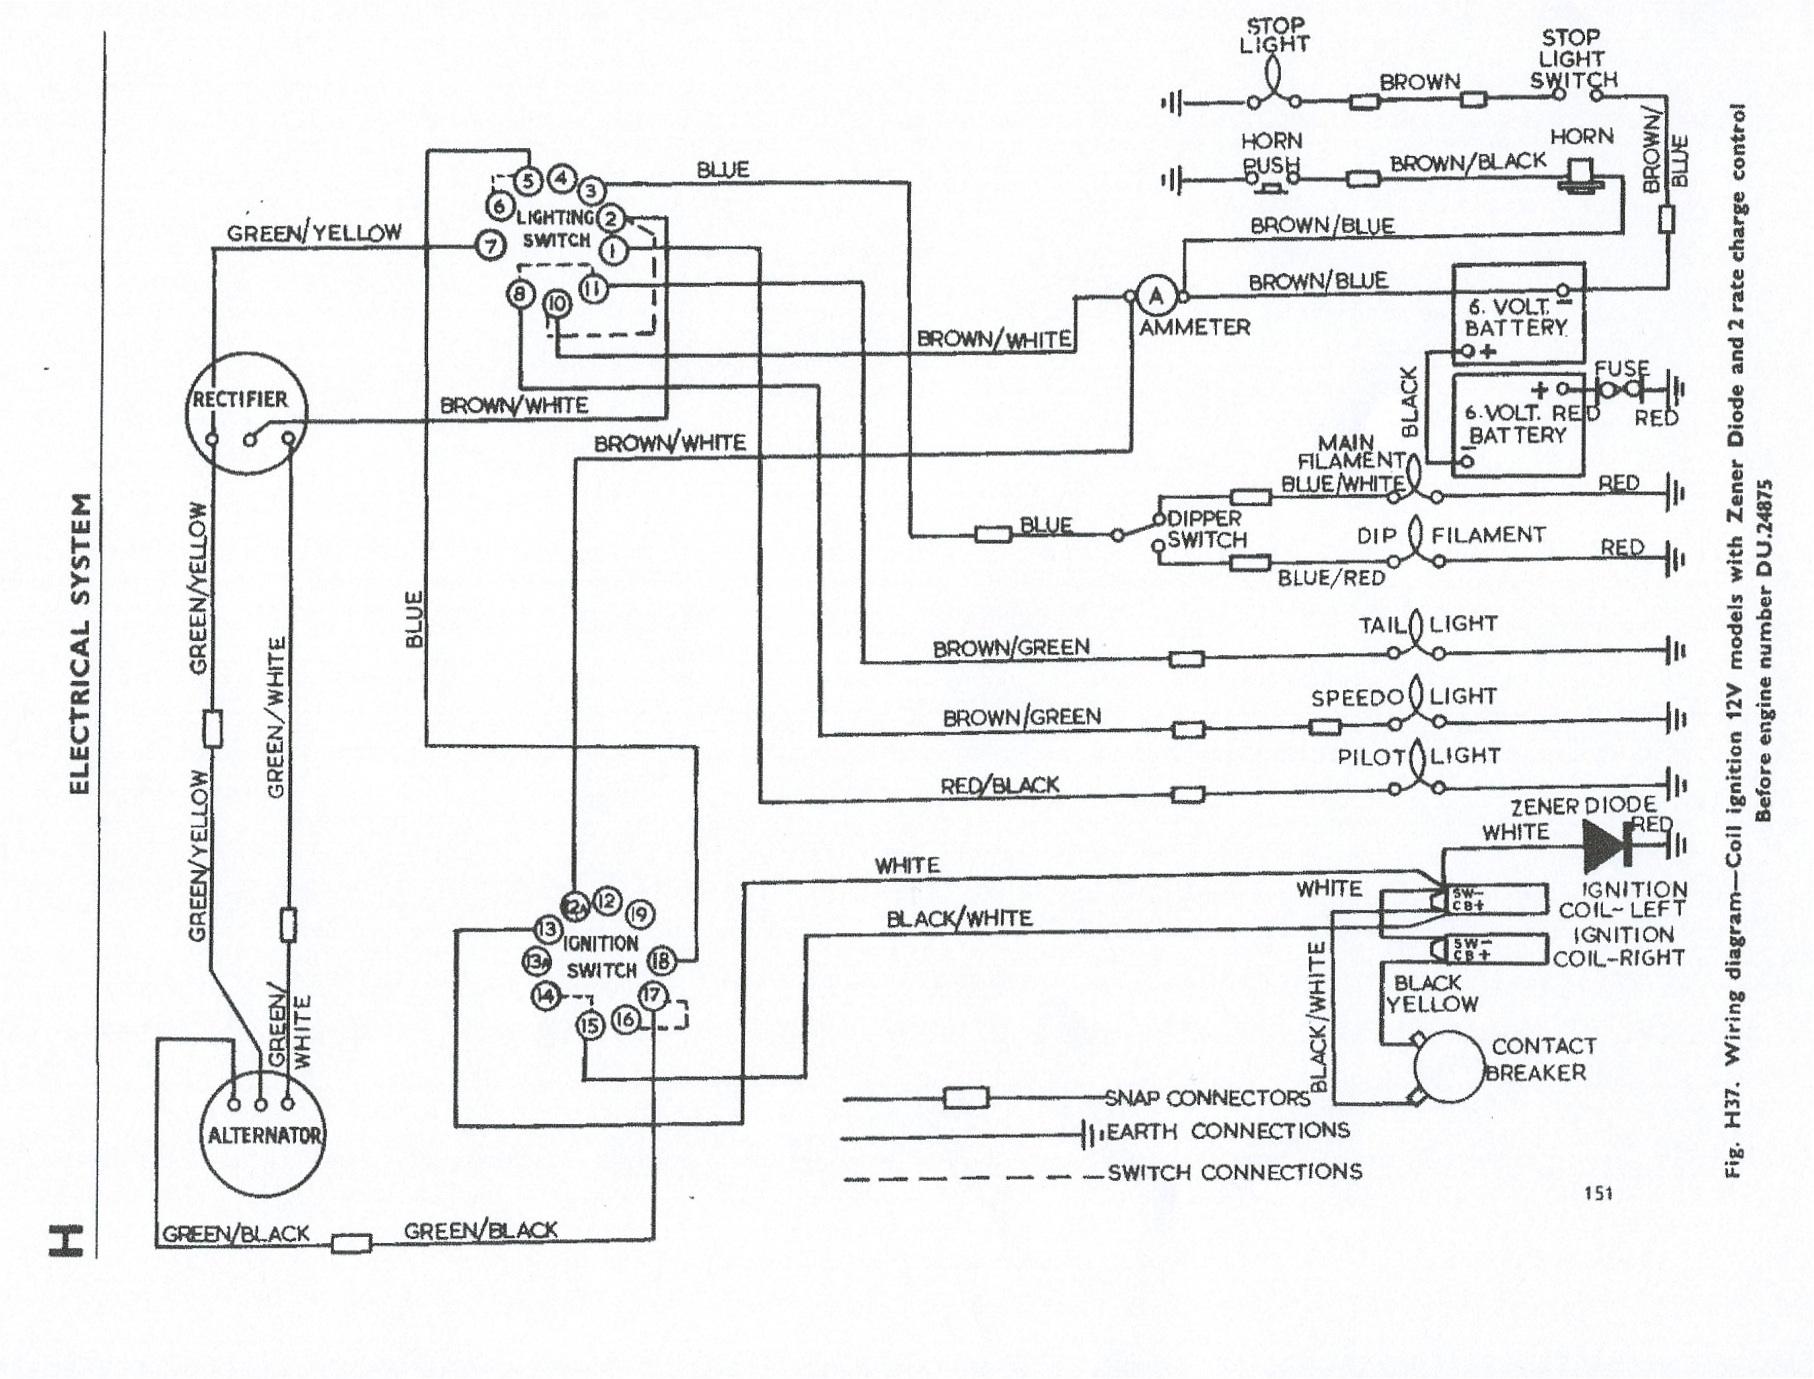 [WLLP_2054]   XR_9879] Triumph Tr6 Wiring Diagram On 1973 Triumph Bonneville Wiring  Diagram Wiring Diagram | Triumph Chopper Wiring Diagram |  | Skat Ultr Mohammedshrine Librar Wiring 101